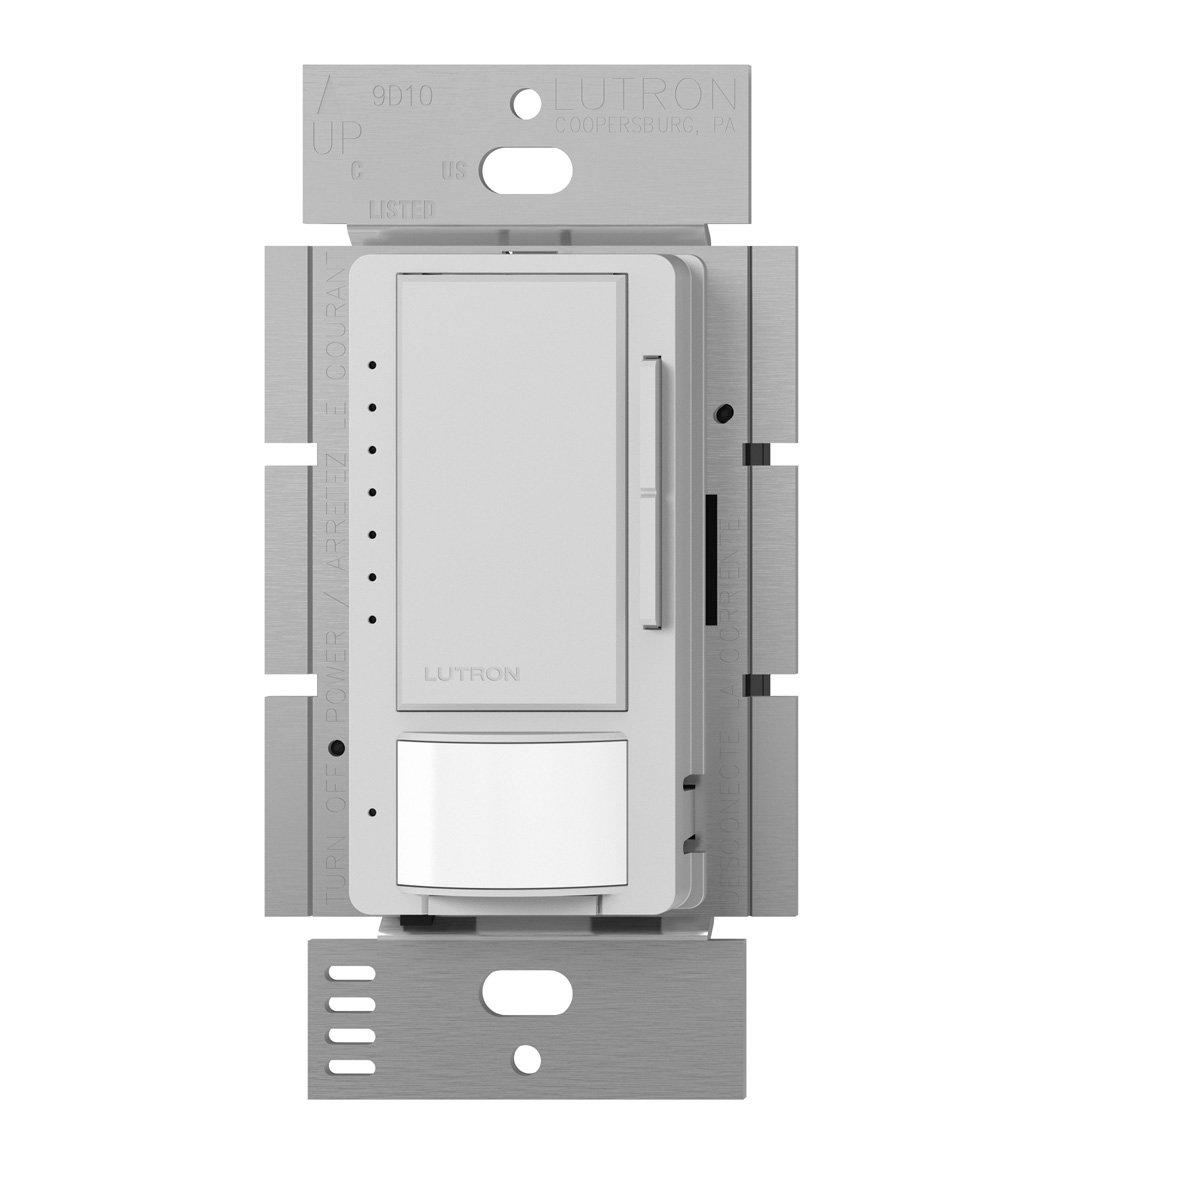 (Palladium) - Lutron MSCL-VP153M-PD Maestro CL Single Pole Multi Location Vacancy Sensing Dimmer, Palladium B00FQL2BX2 Palladium Palladium